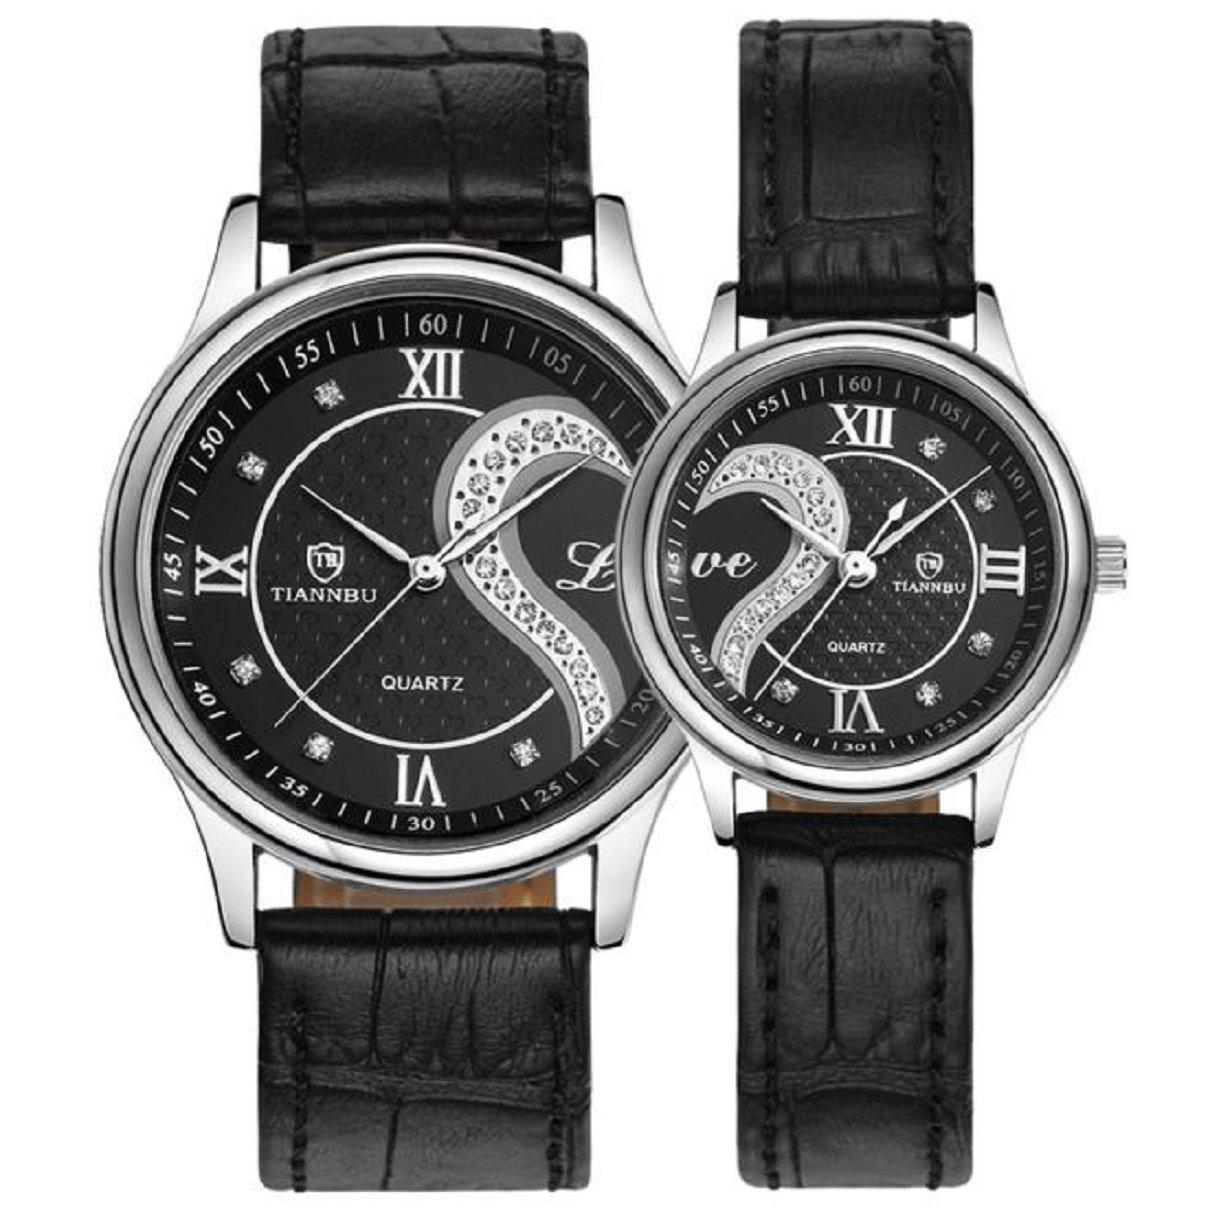 Lookatool 1 Pair/2pc Tiannbu Ultrathin Leather Romantic Fashion Couple Wrist Watches by Lookatool